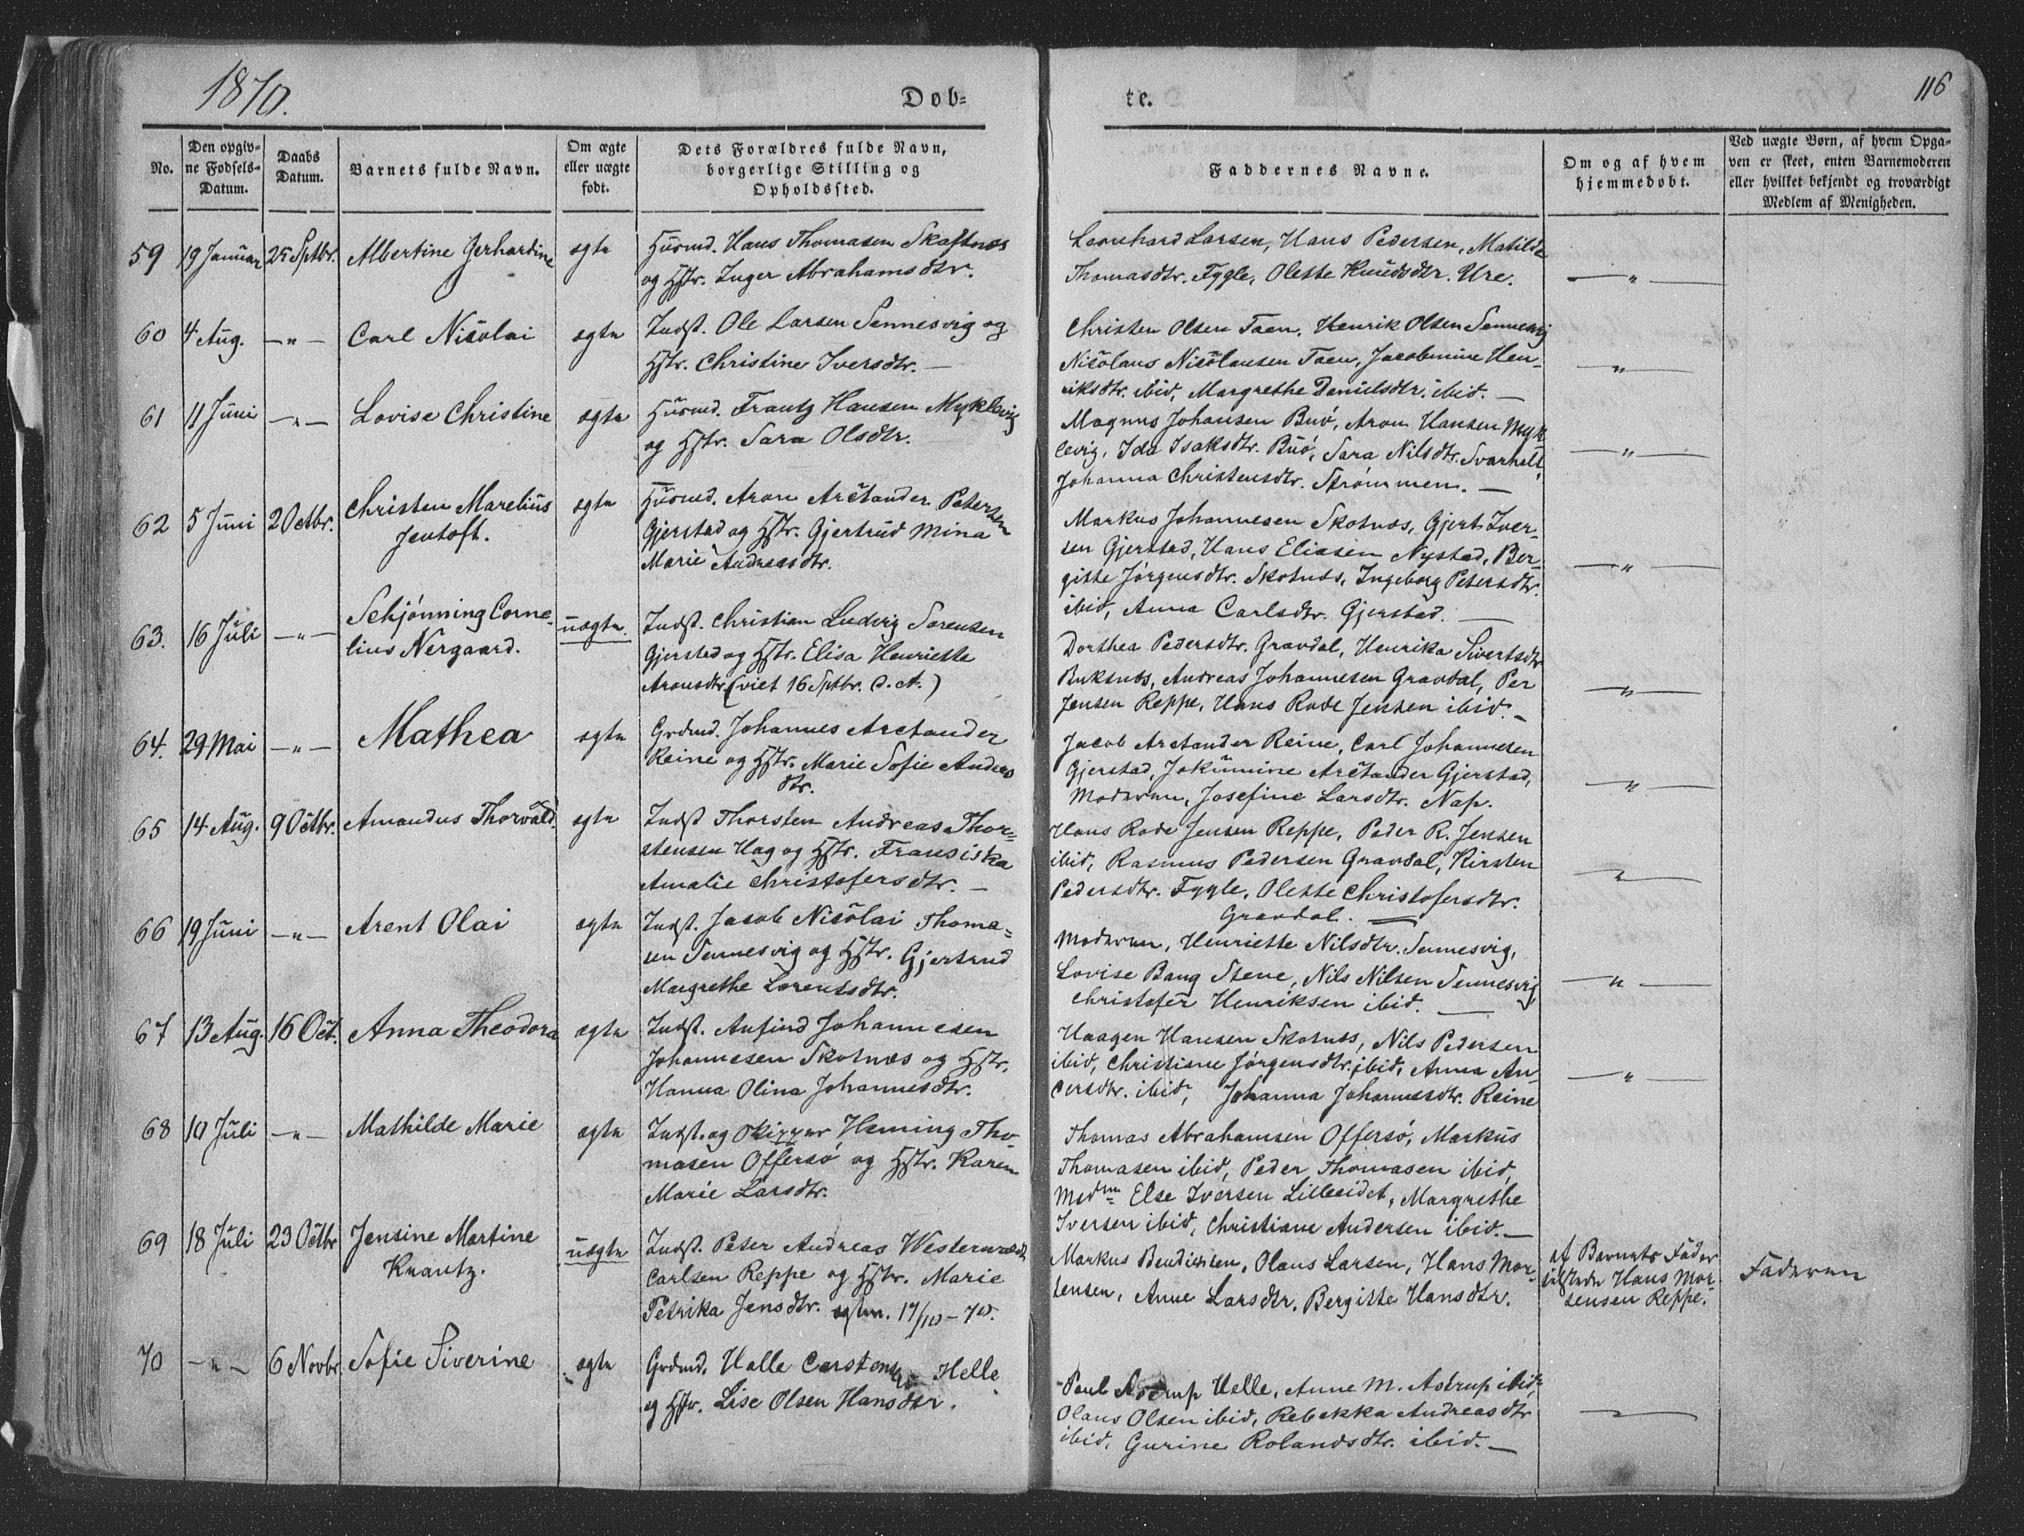 SAT, Ministerialprotokoller, klokkerbøker og fødselsregistre - Nordland, 881/L1165: Klokkerbok nr. 881C02, 1854-1876, s. 116